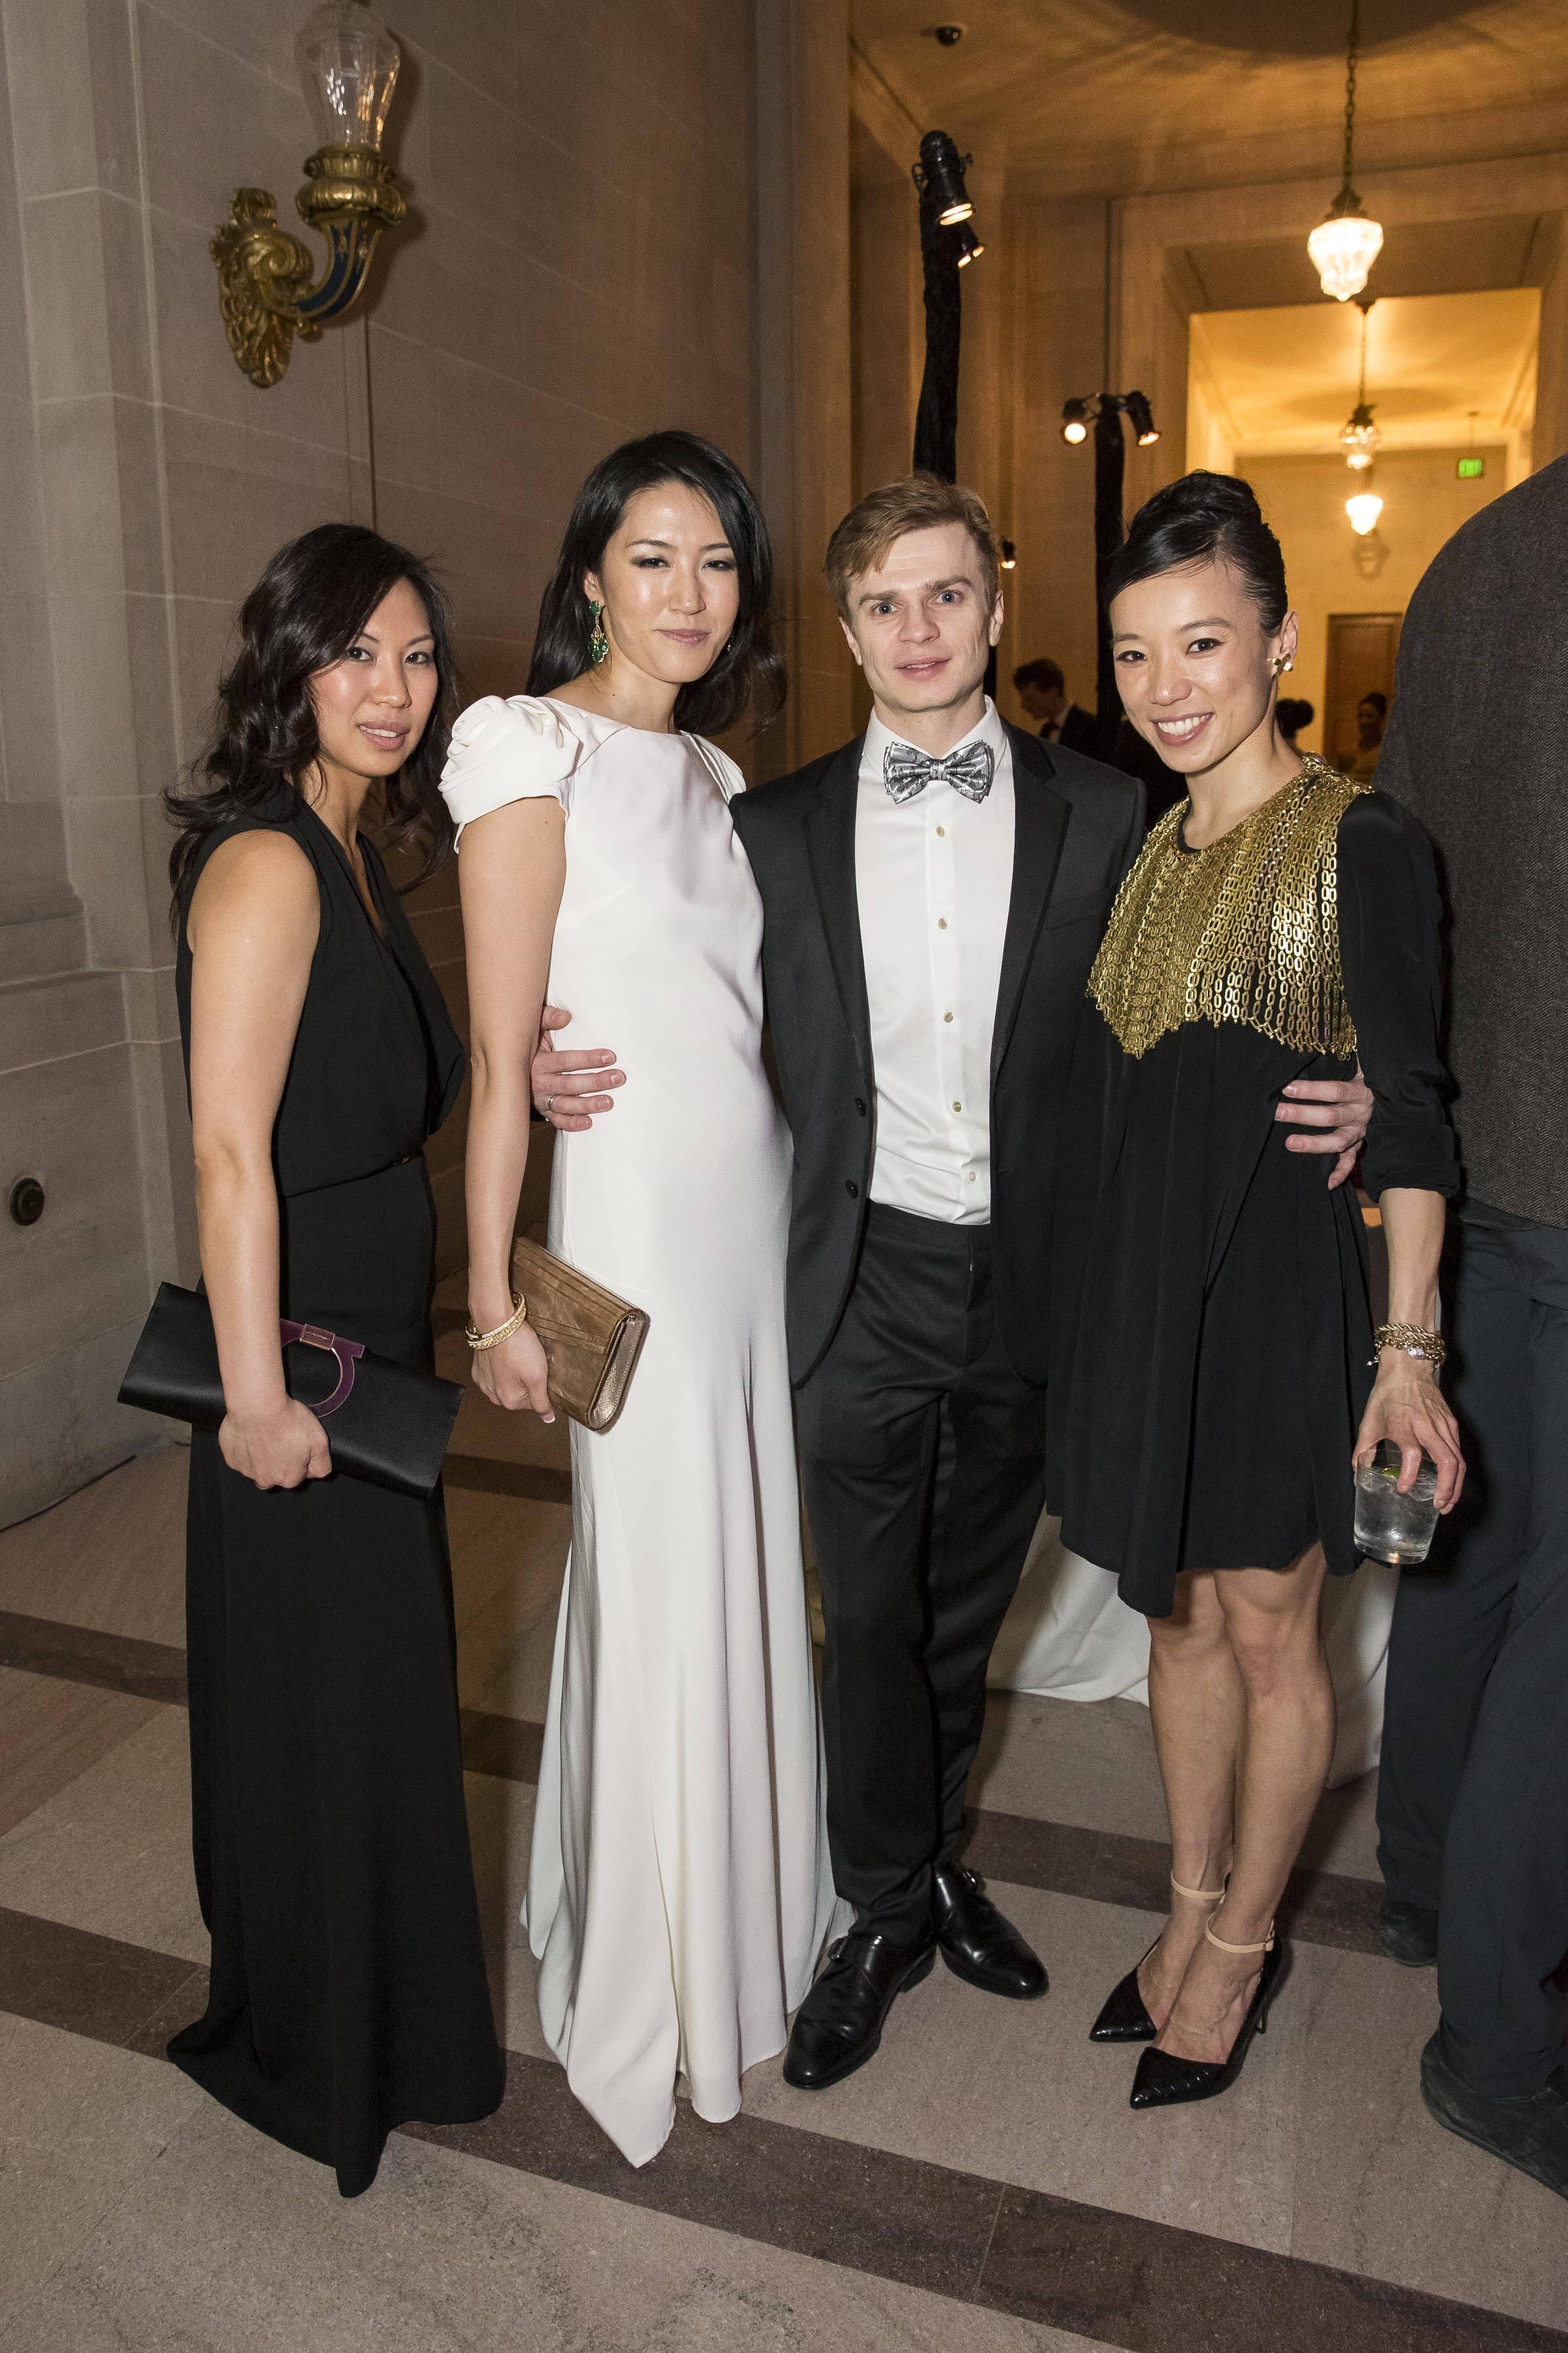 Becky Trinh, Mino Nedvigin, Gennadi Nedvigin, Frances Chung